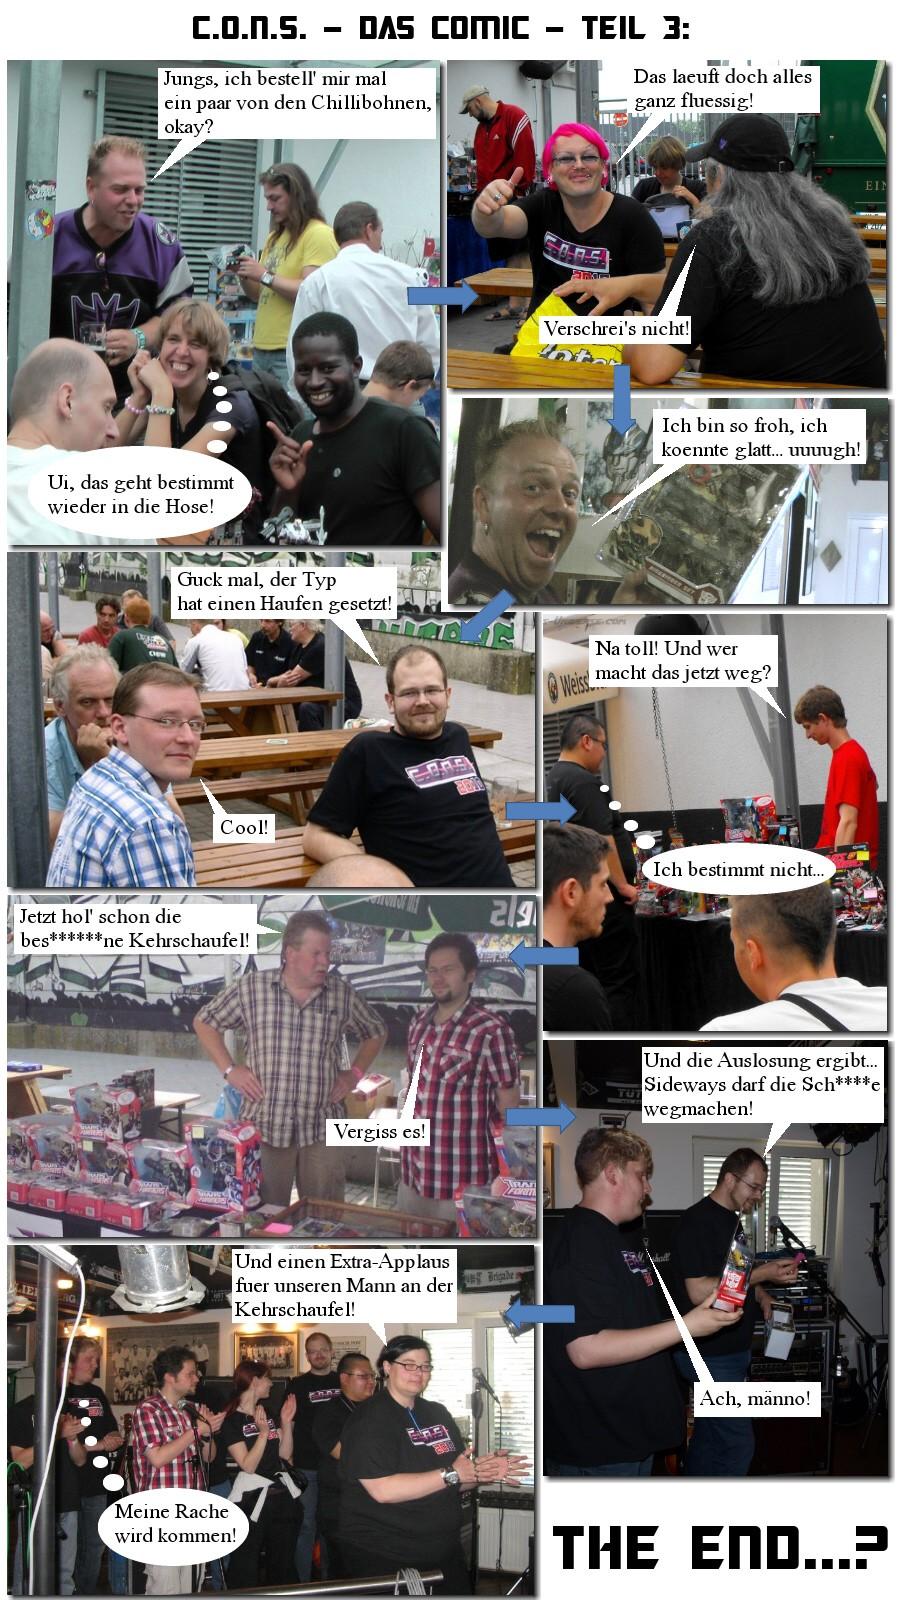 CONS Comic Teil 3